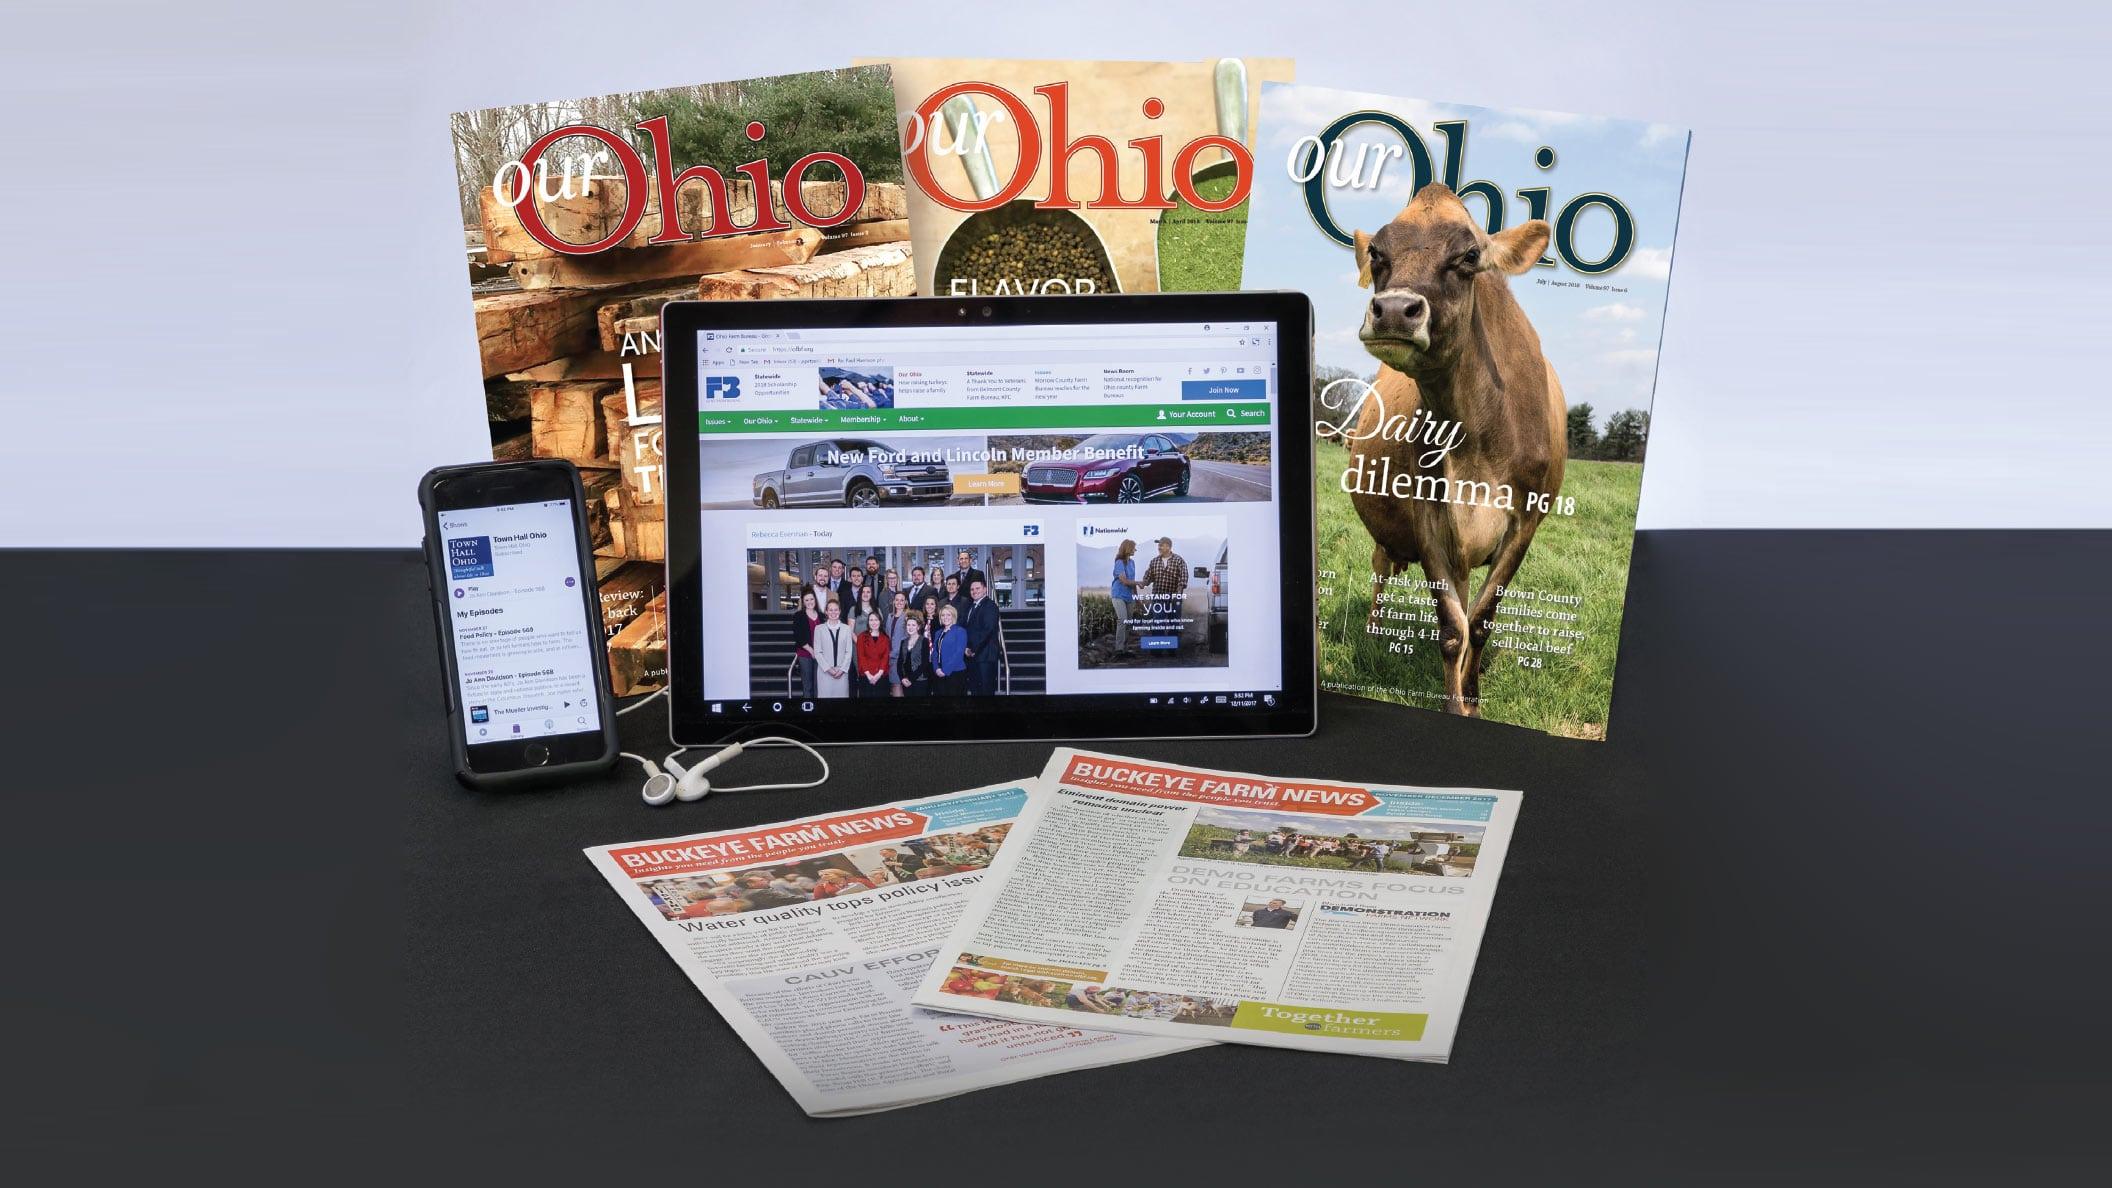 2019 Ohio Farm Bureau Media Kit hero image